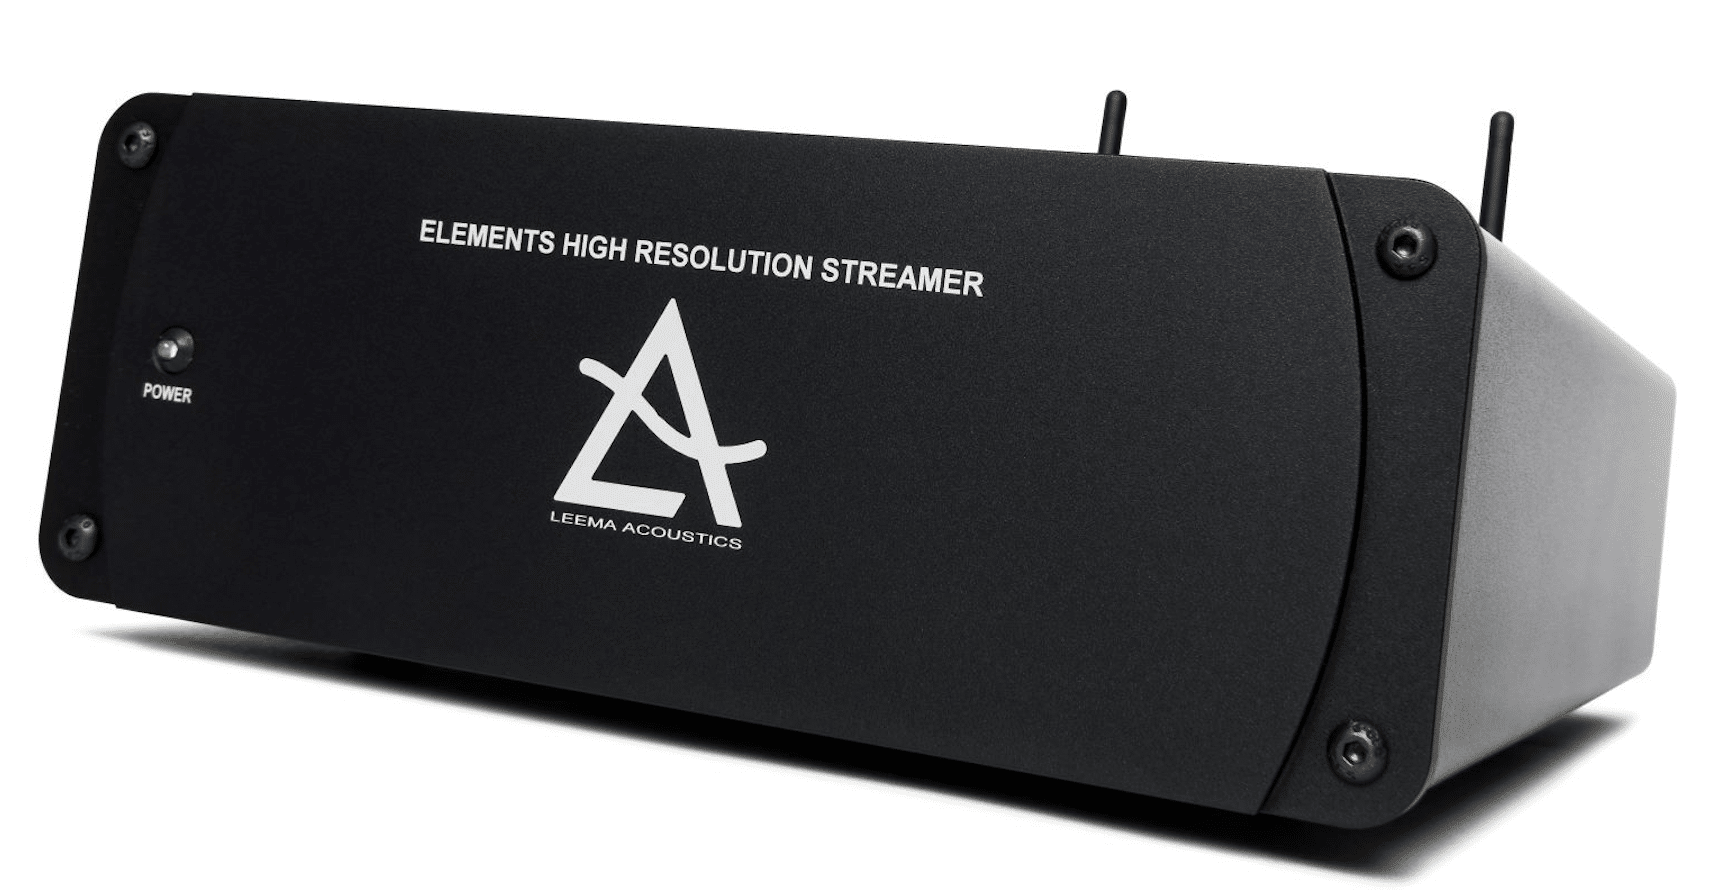 Elements Streamer From Leema